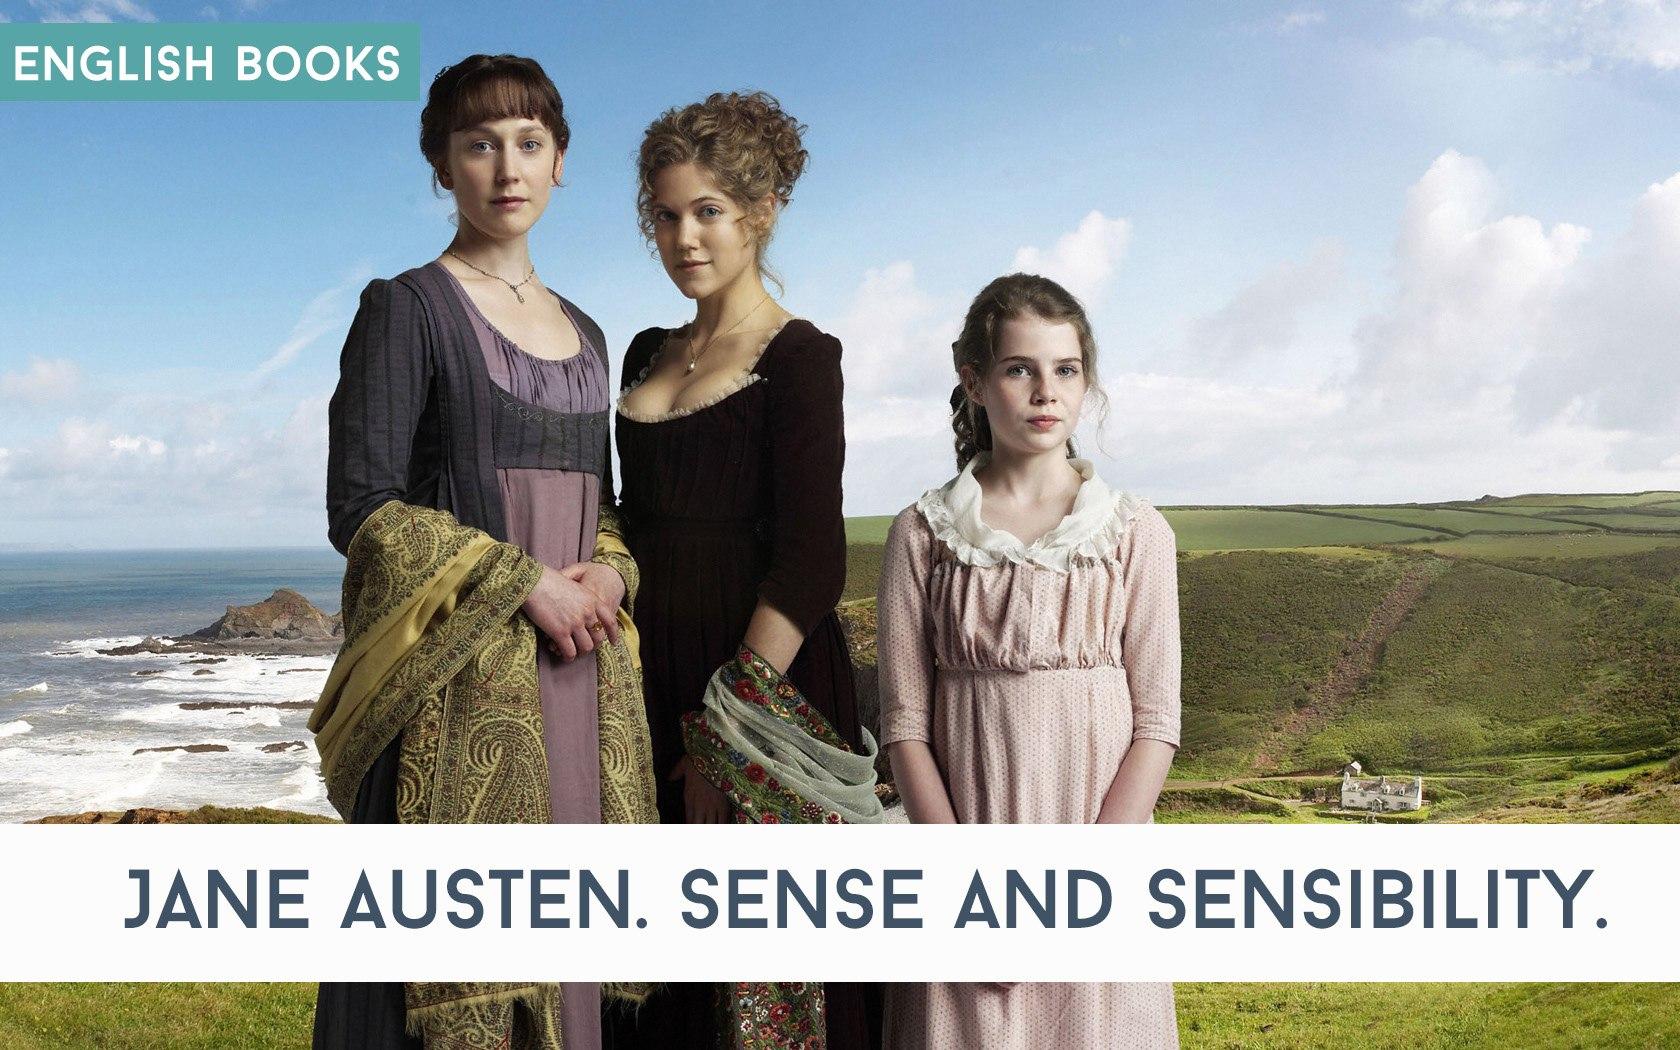 Jane Austen — Sense And Sensibility